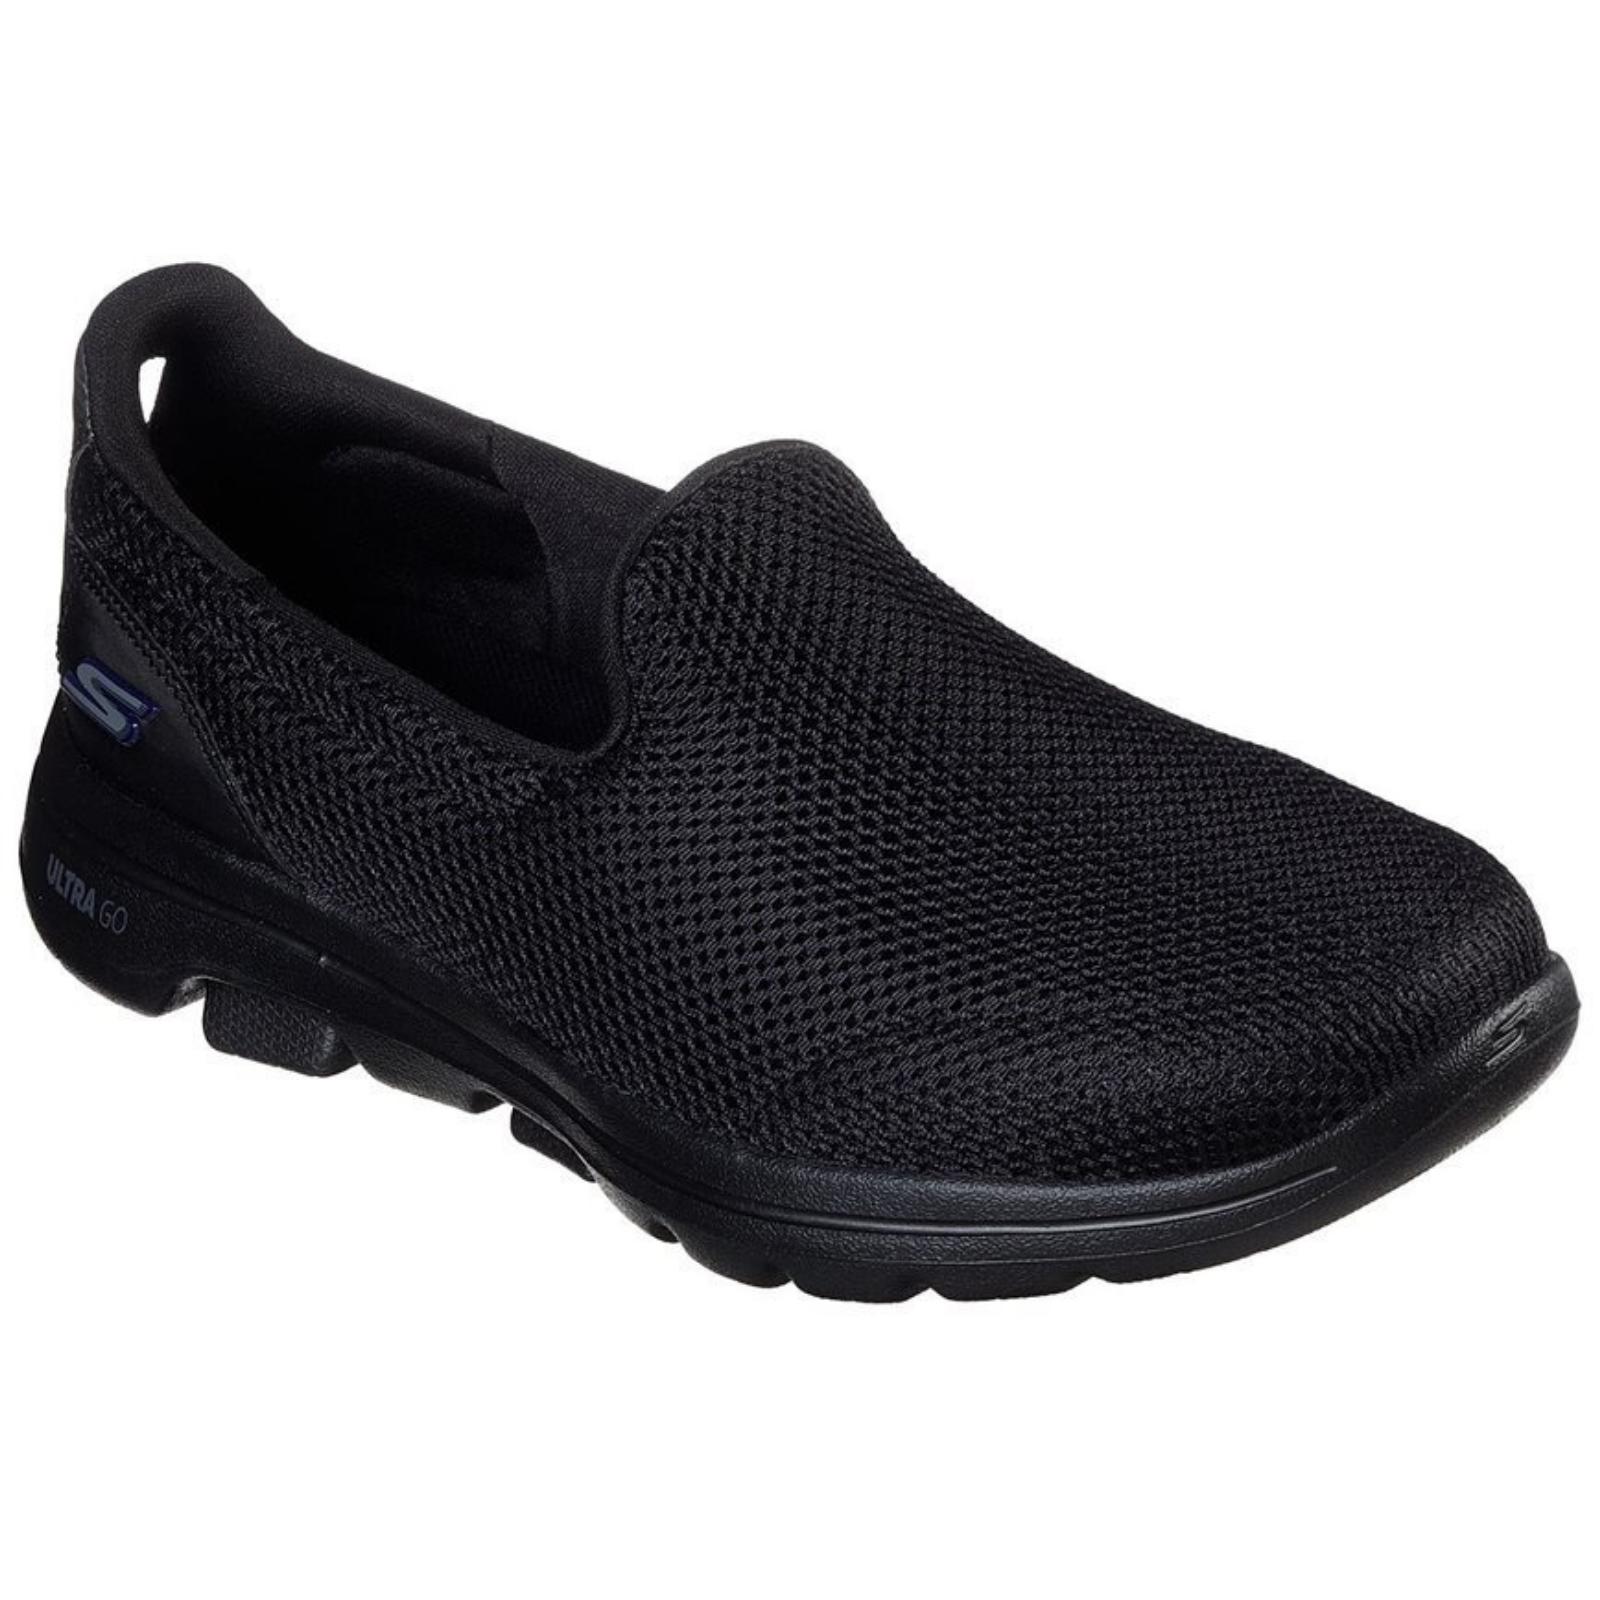 Skechers Women's Go Walk 5 Slip On Machine Washable Sneakers Shoes - Black/Black